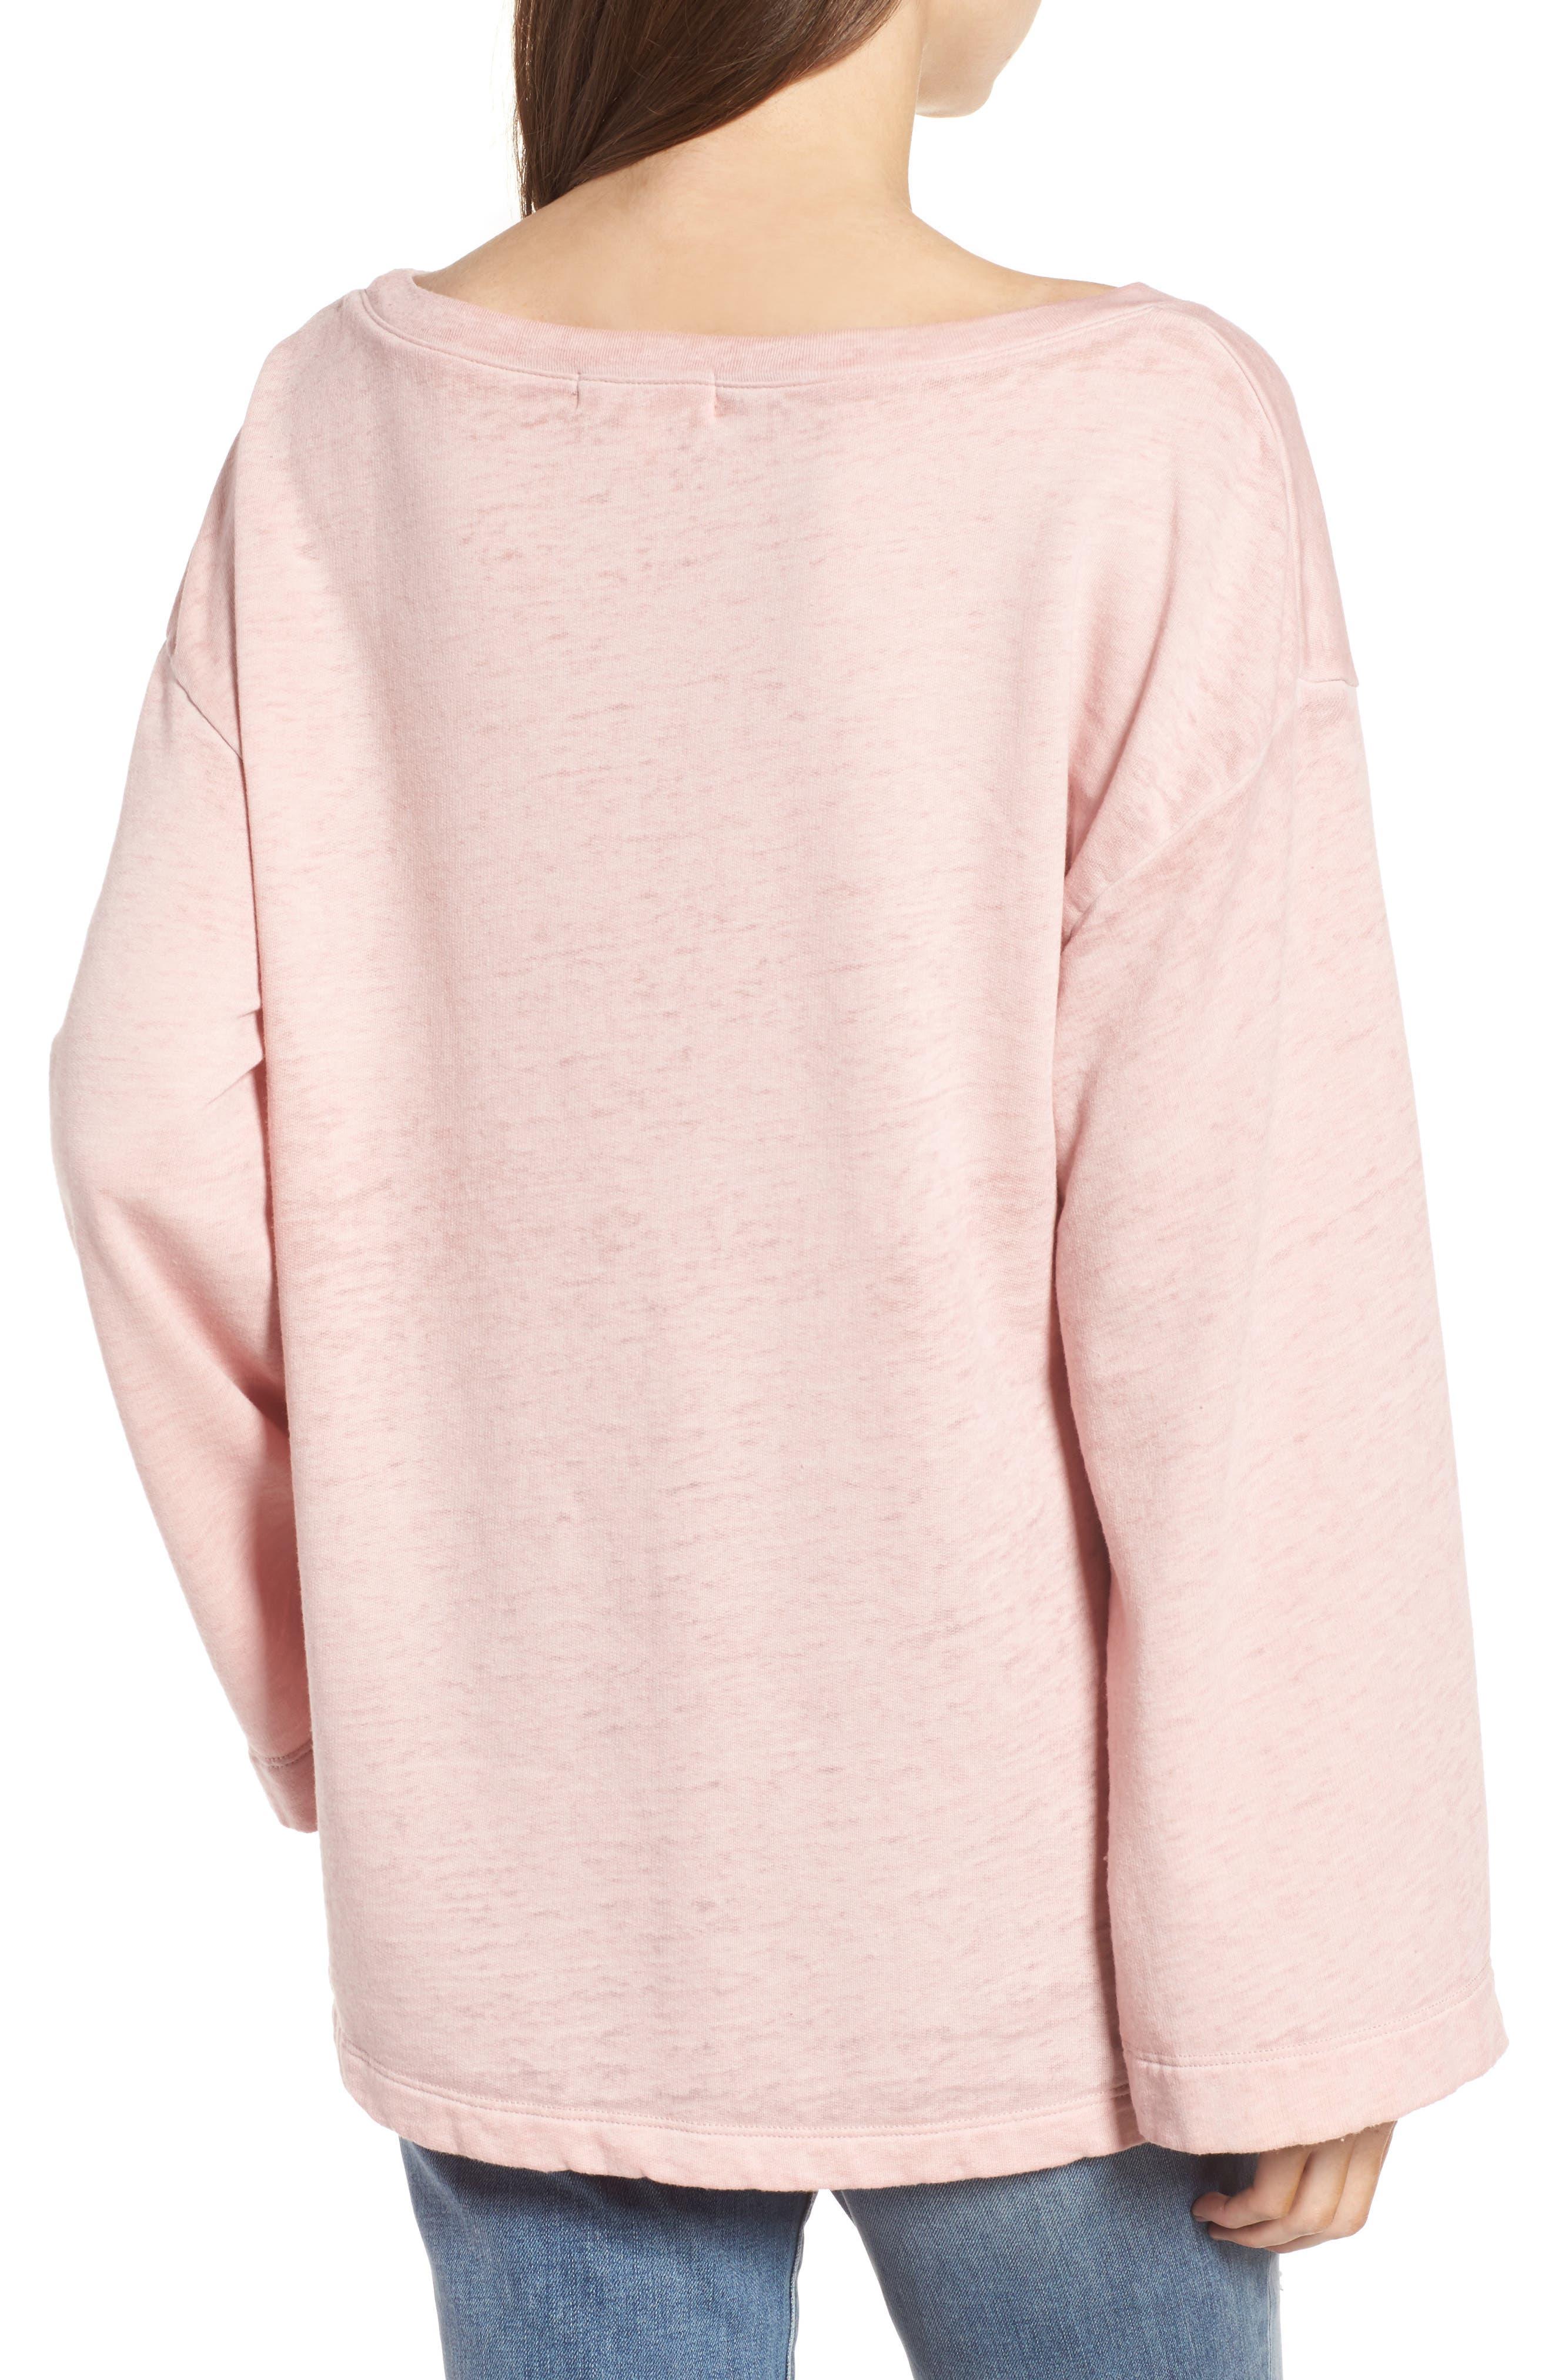 Bell Sleeve Sweatshirt,                             Alternate thumbnail 2, color,                             Pink Silver